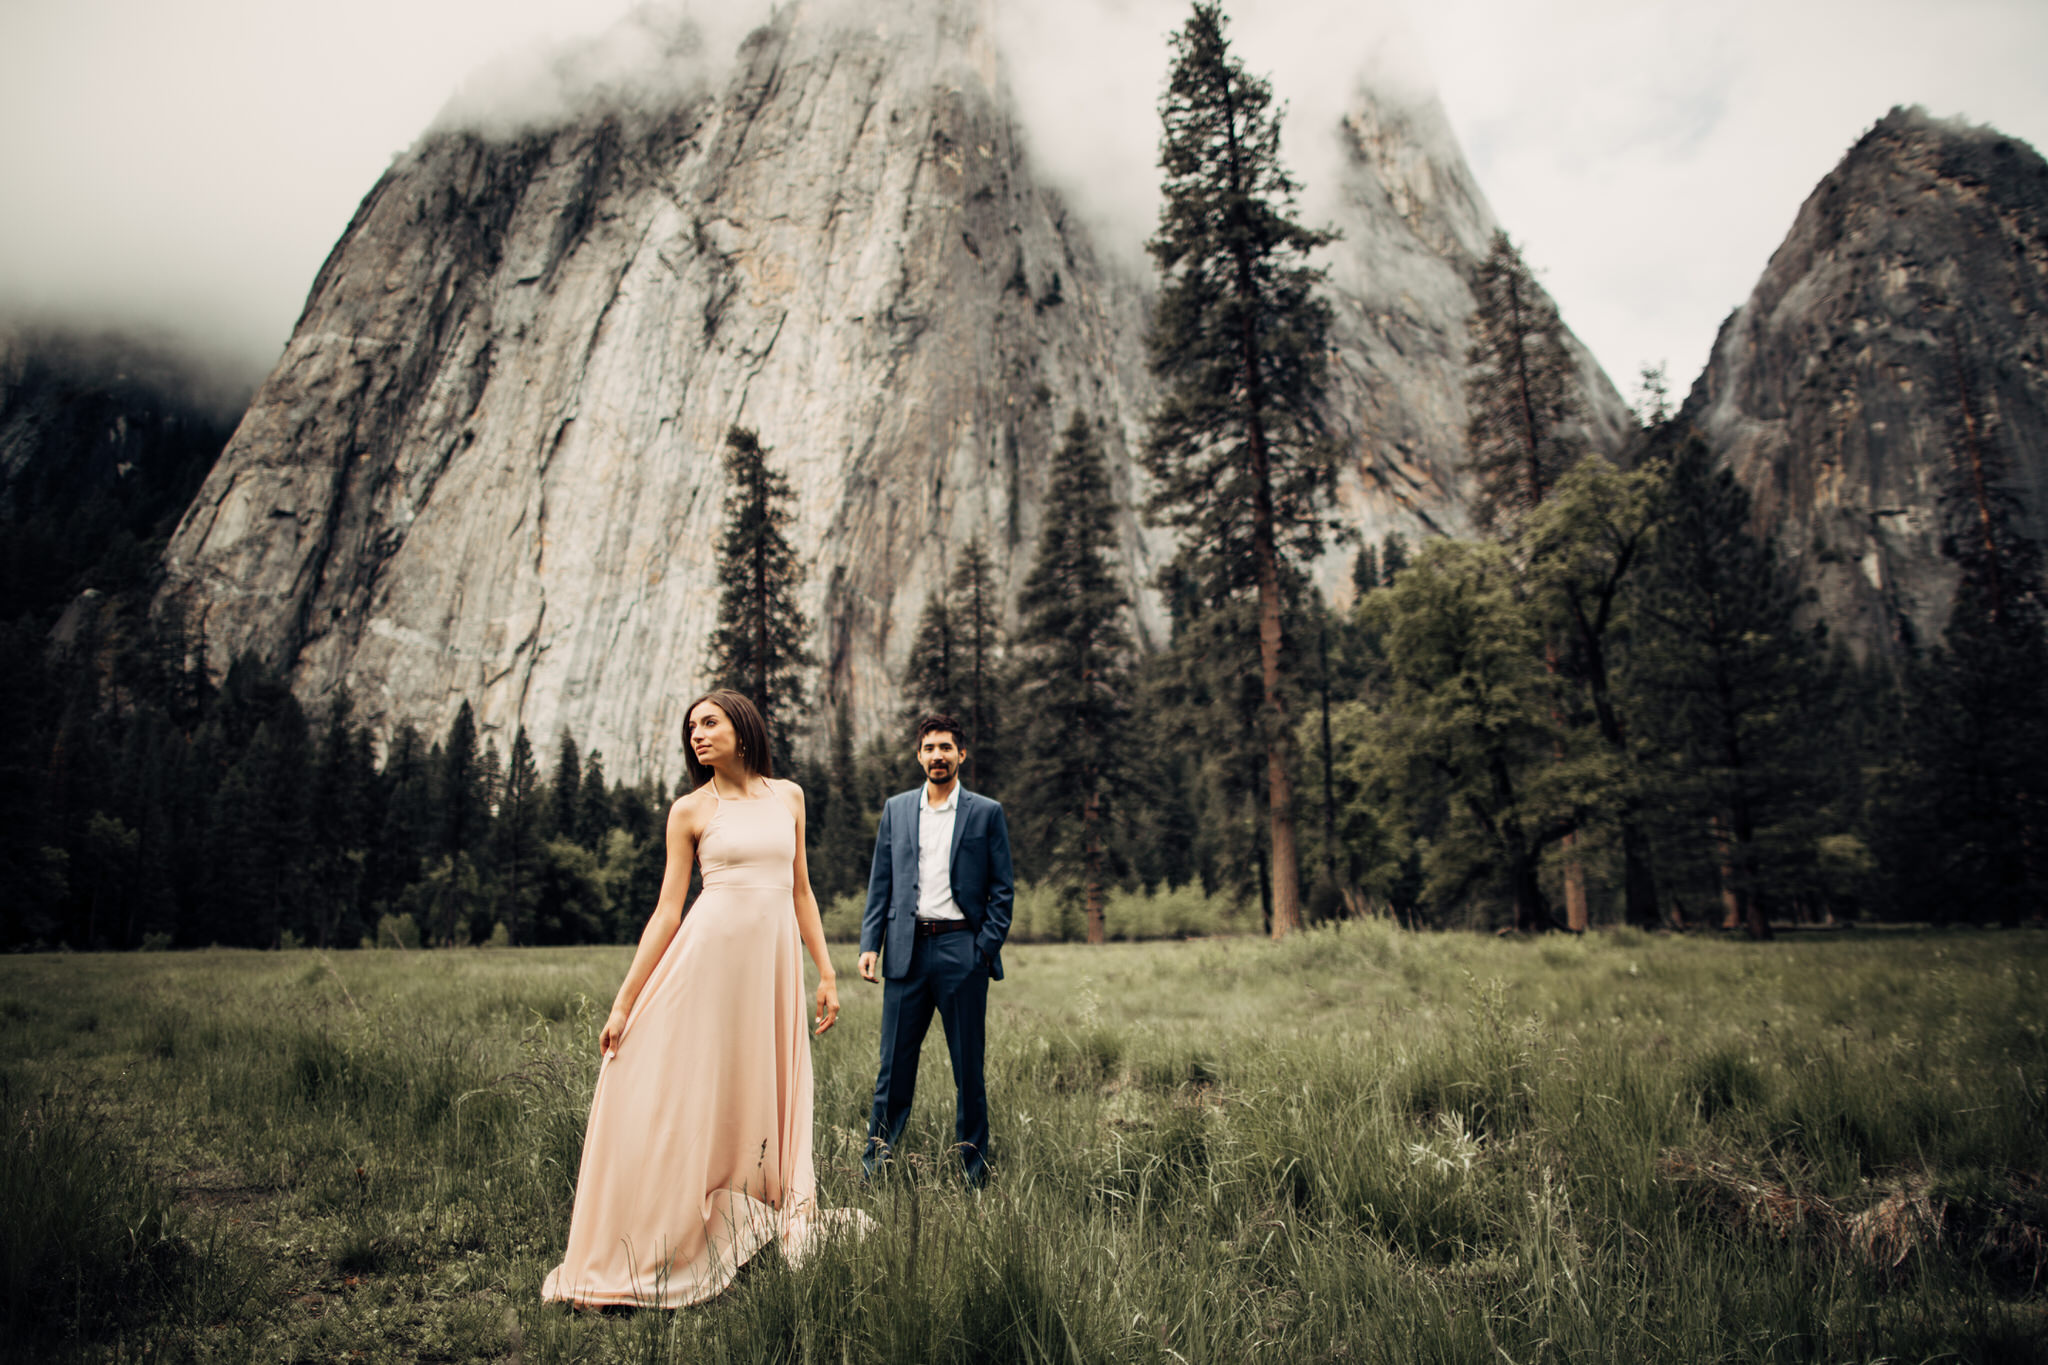 Yosemite-engagement-session-lauren-and-tom65.jpg